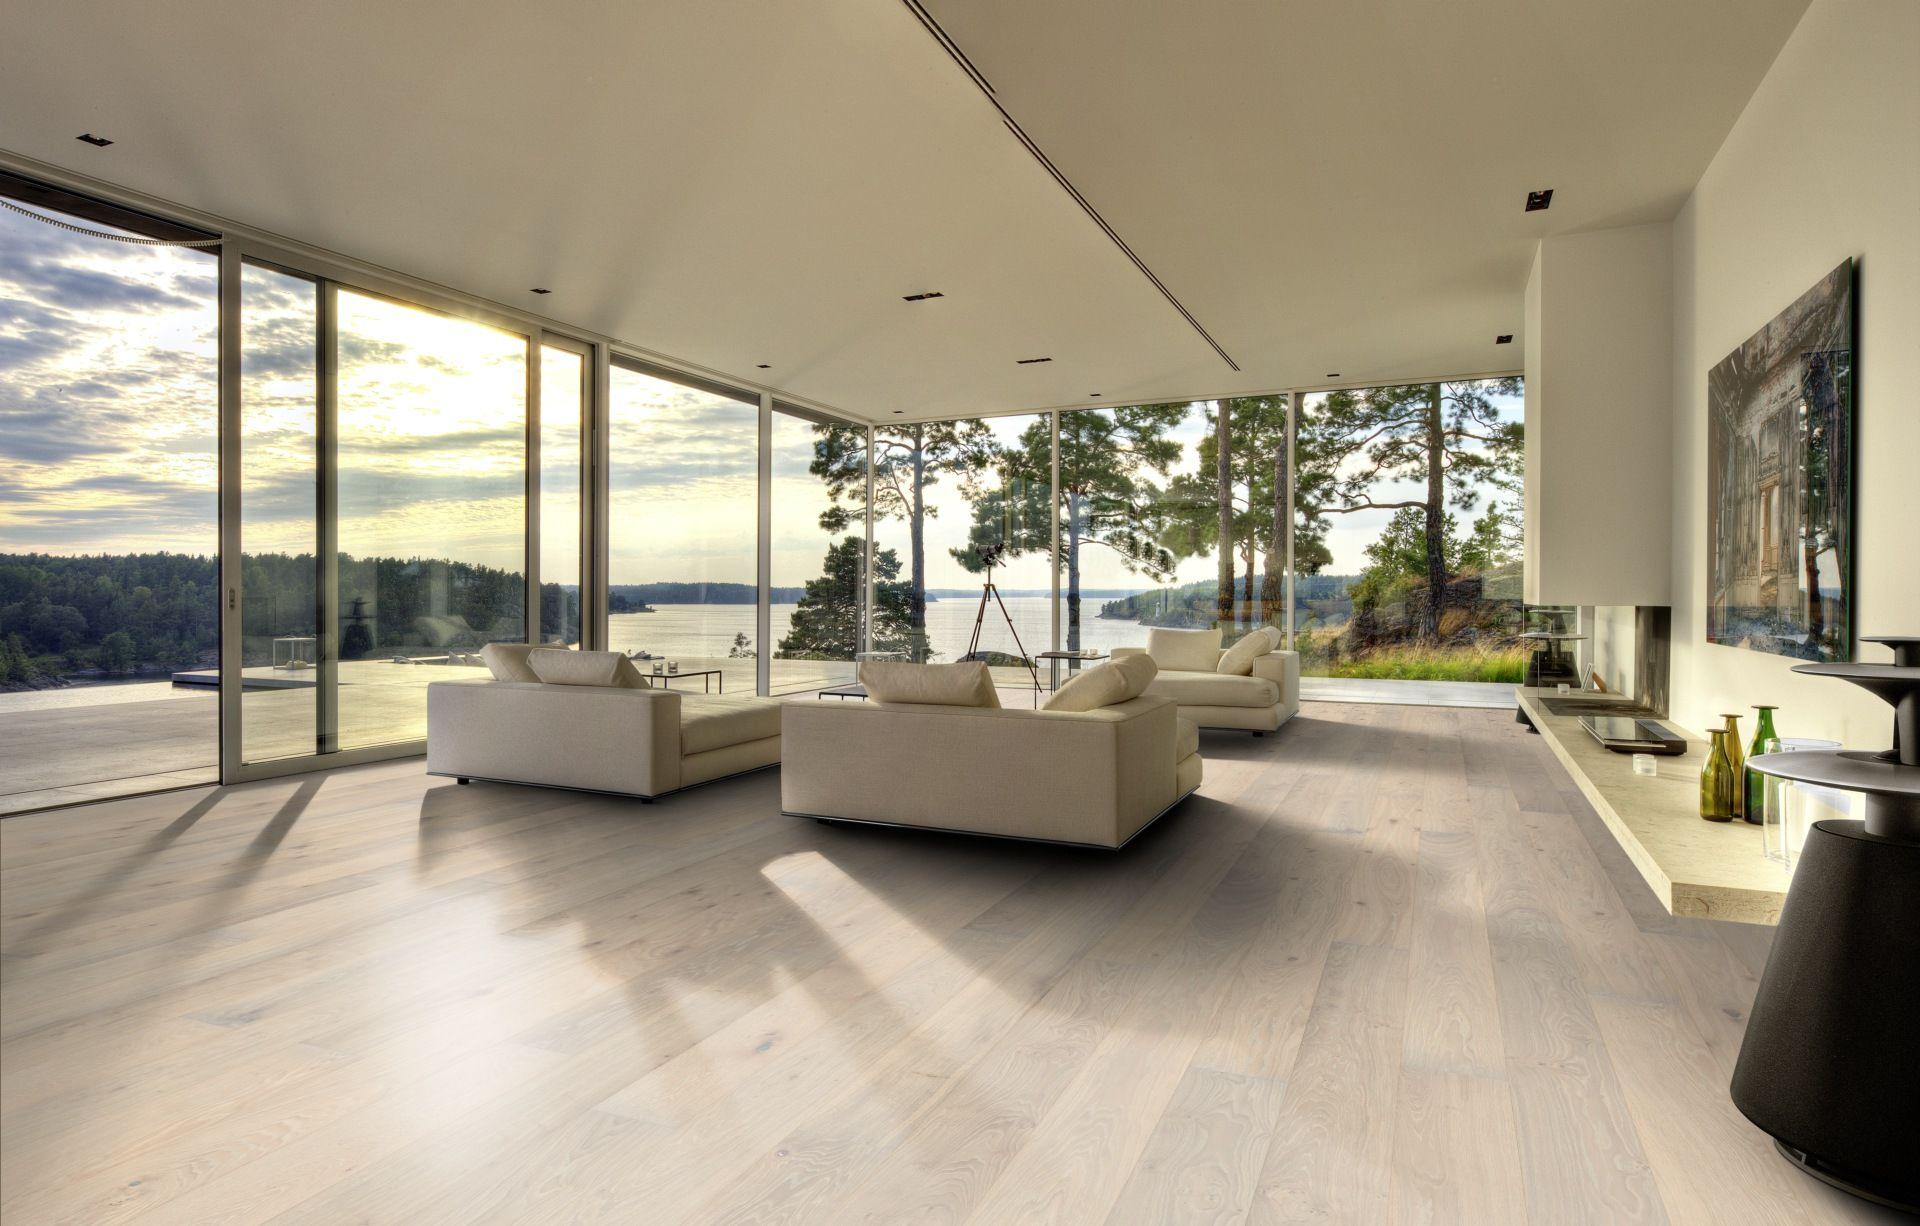 floor of floors hardwoods image color hardwood you with gallery what furniture choose blonde dark